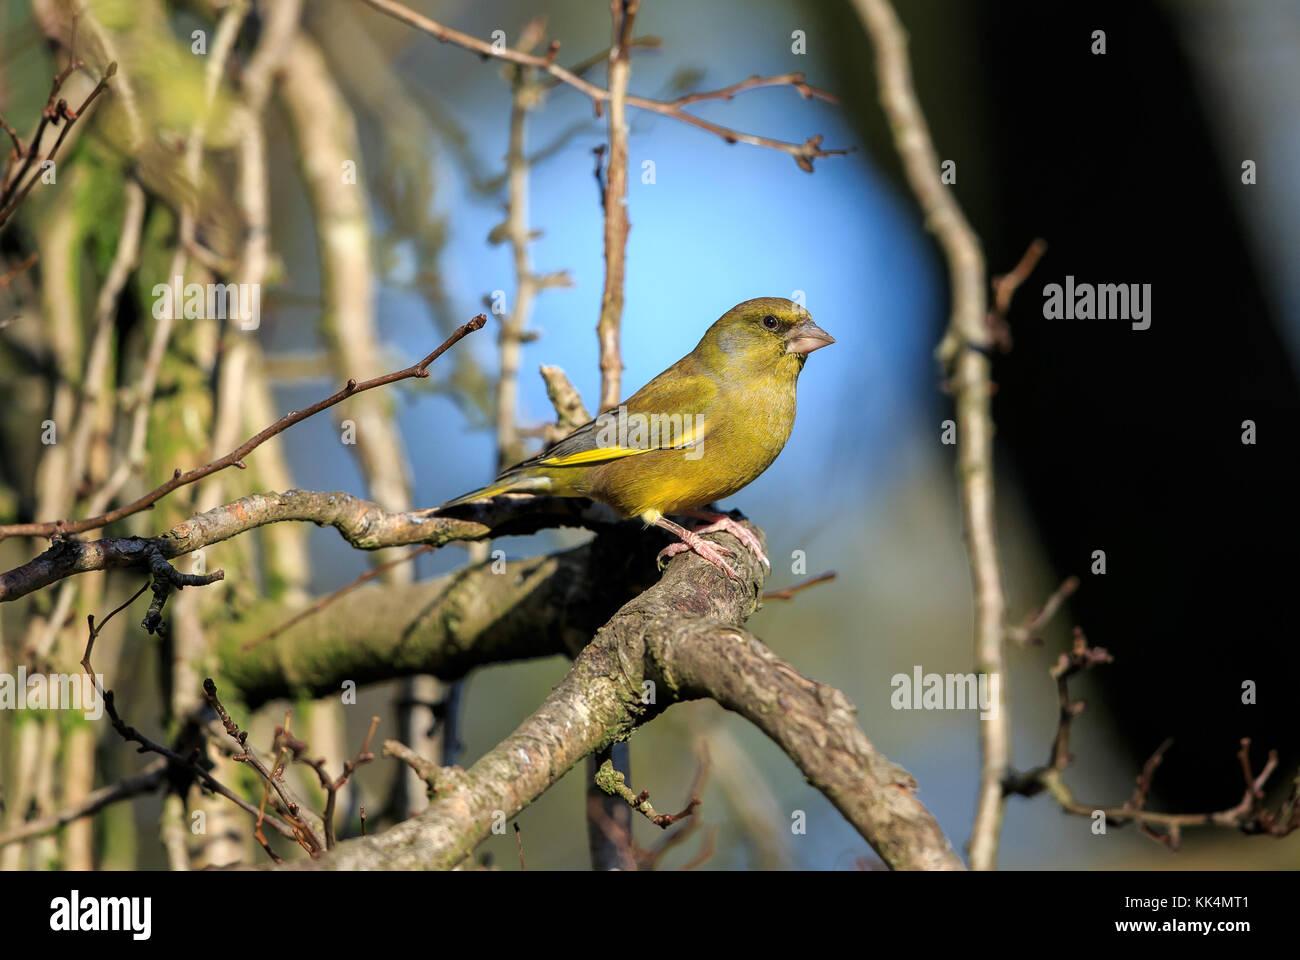 An European Greenfinch Stock Photo